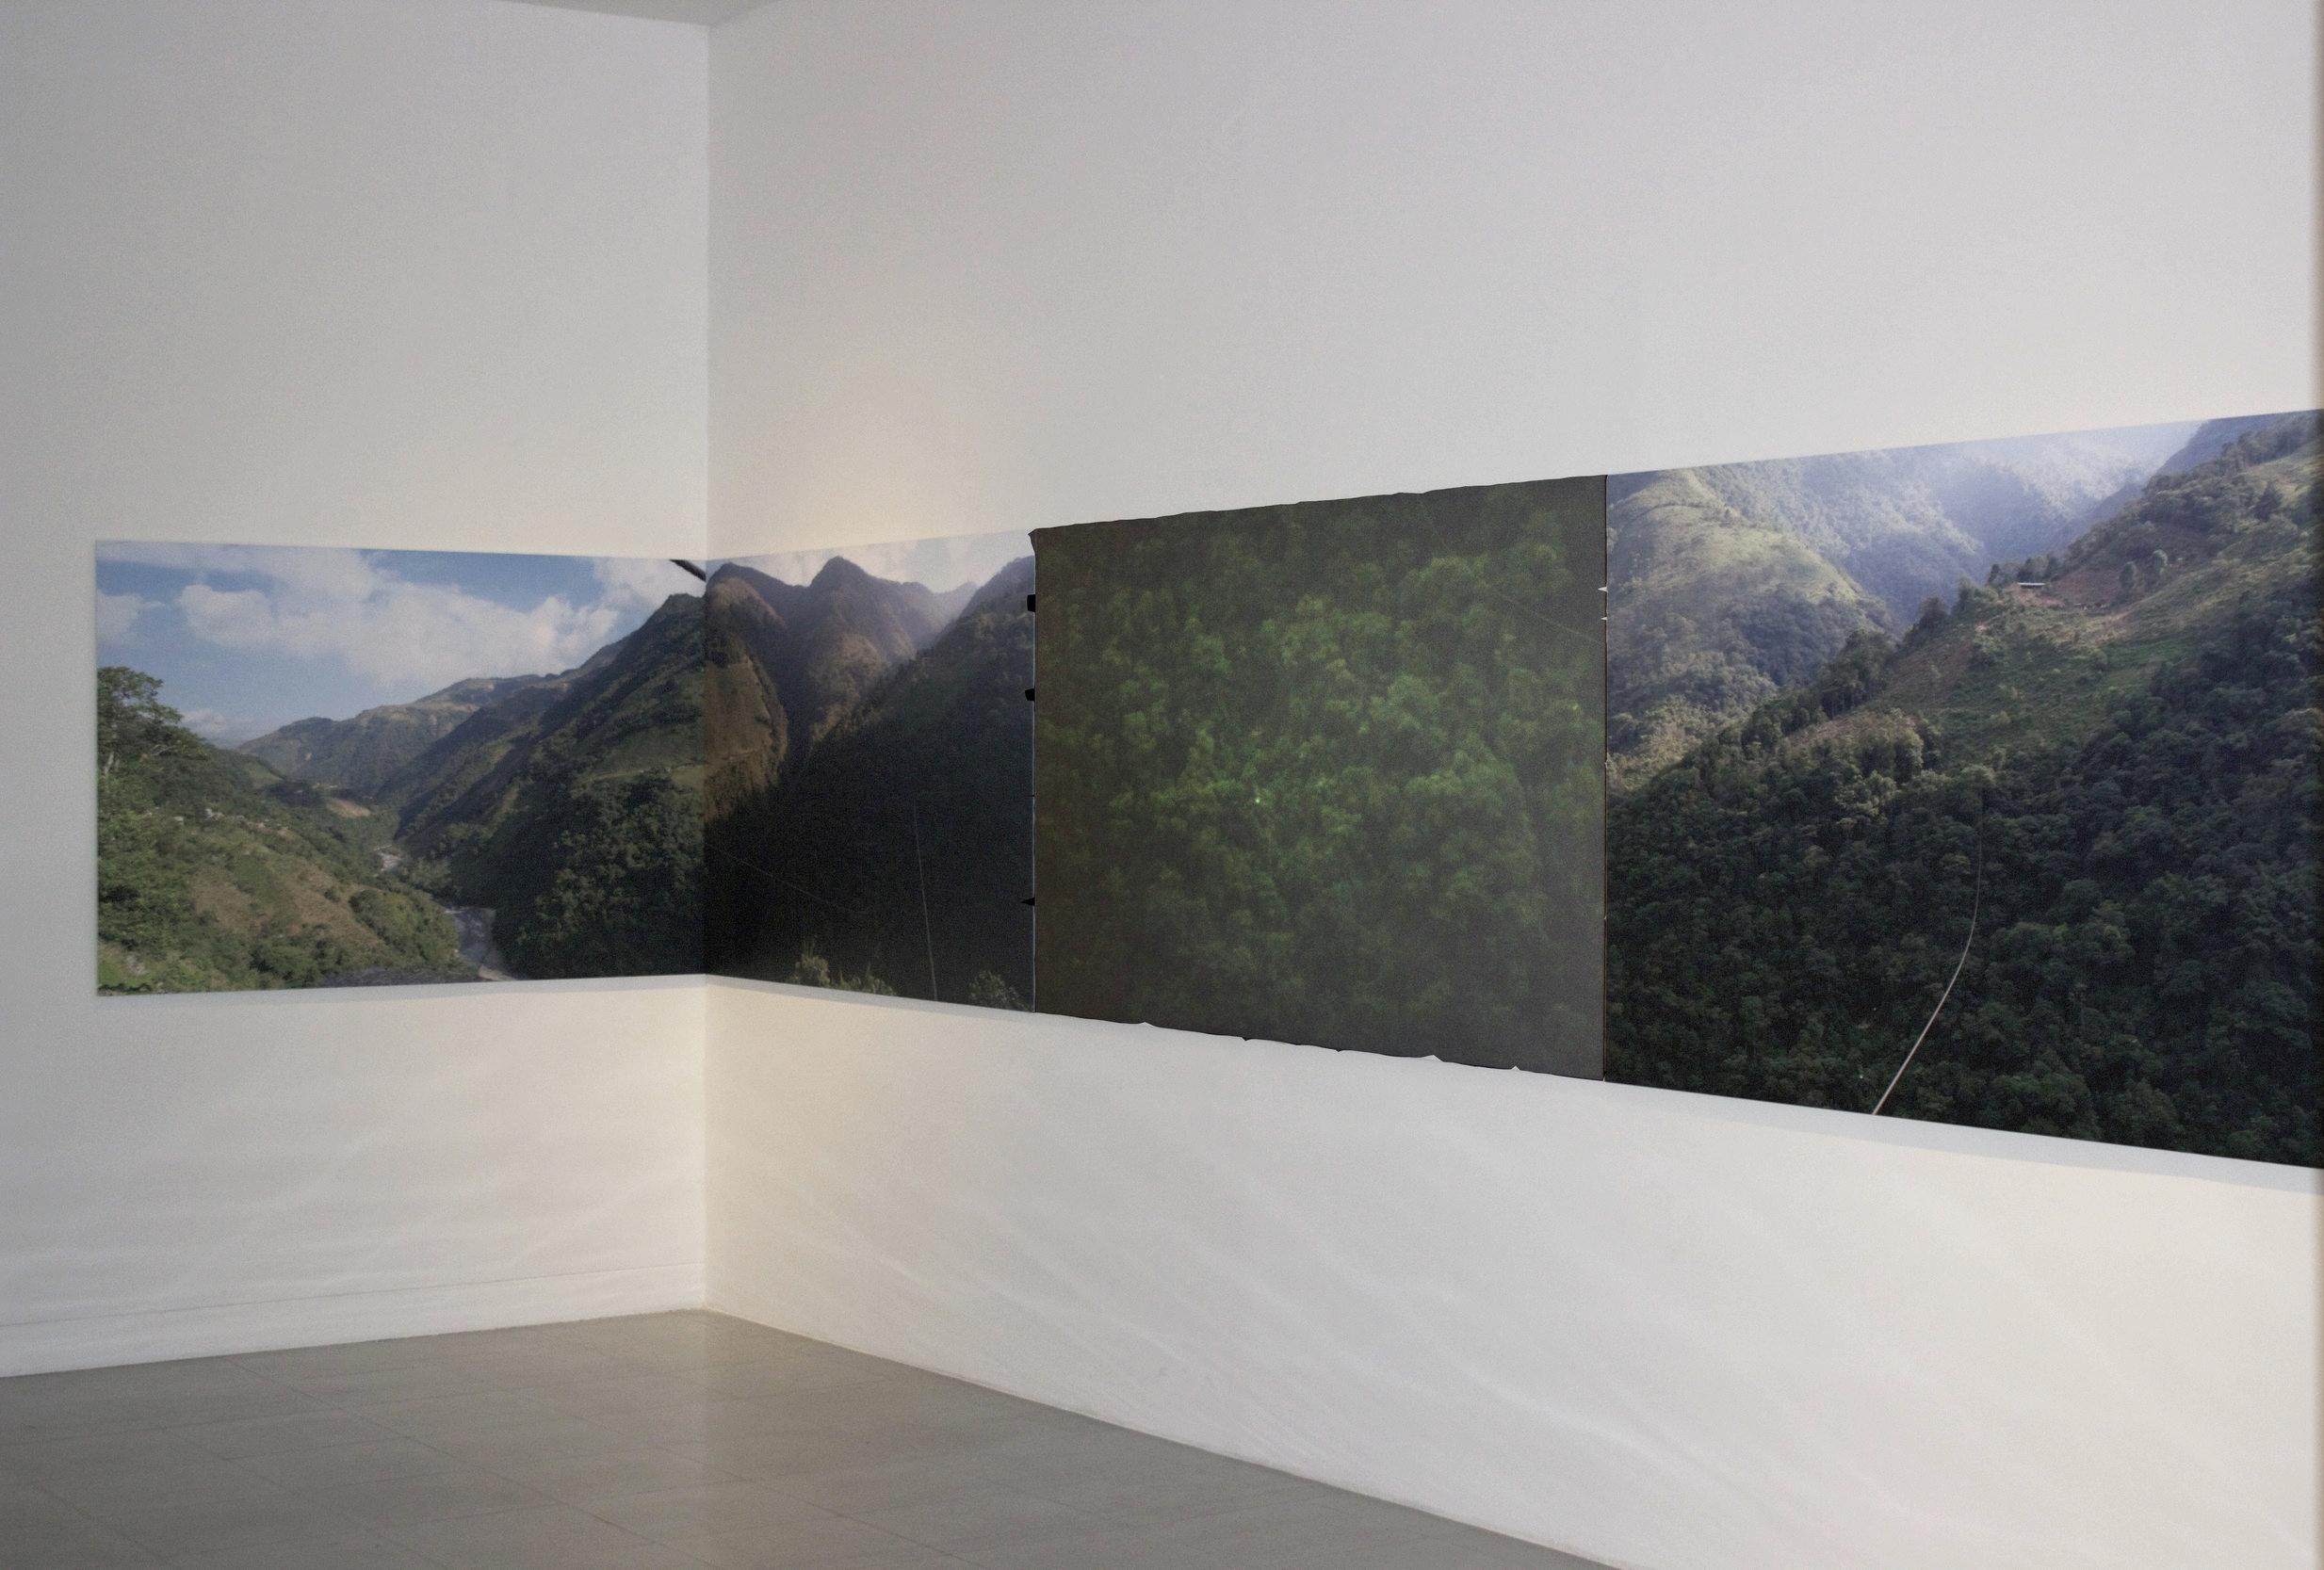 Museo de Antioquia / Garruchas / 2015